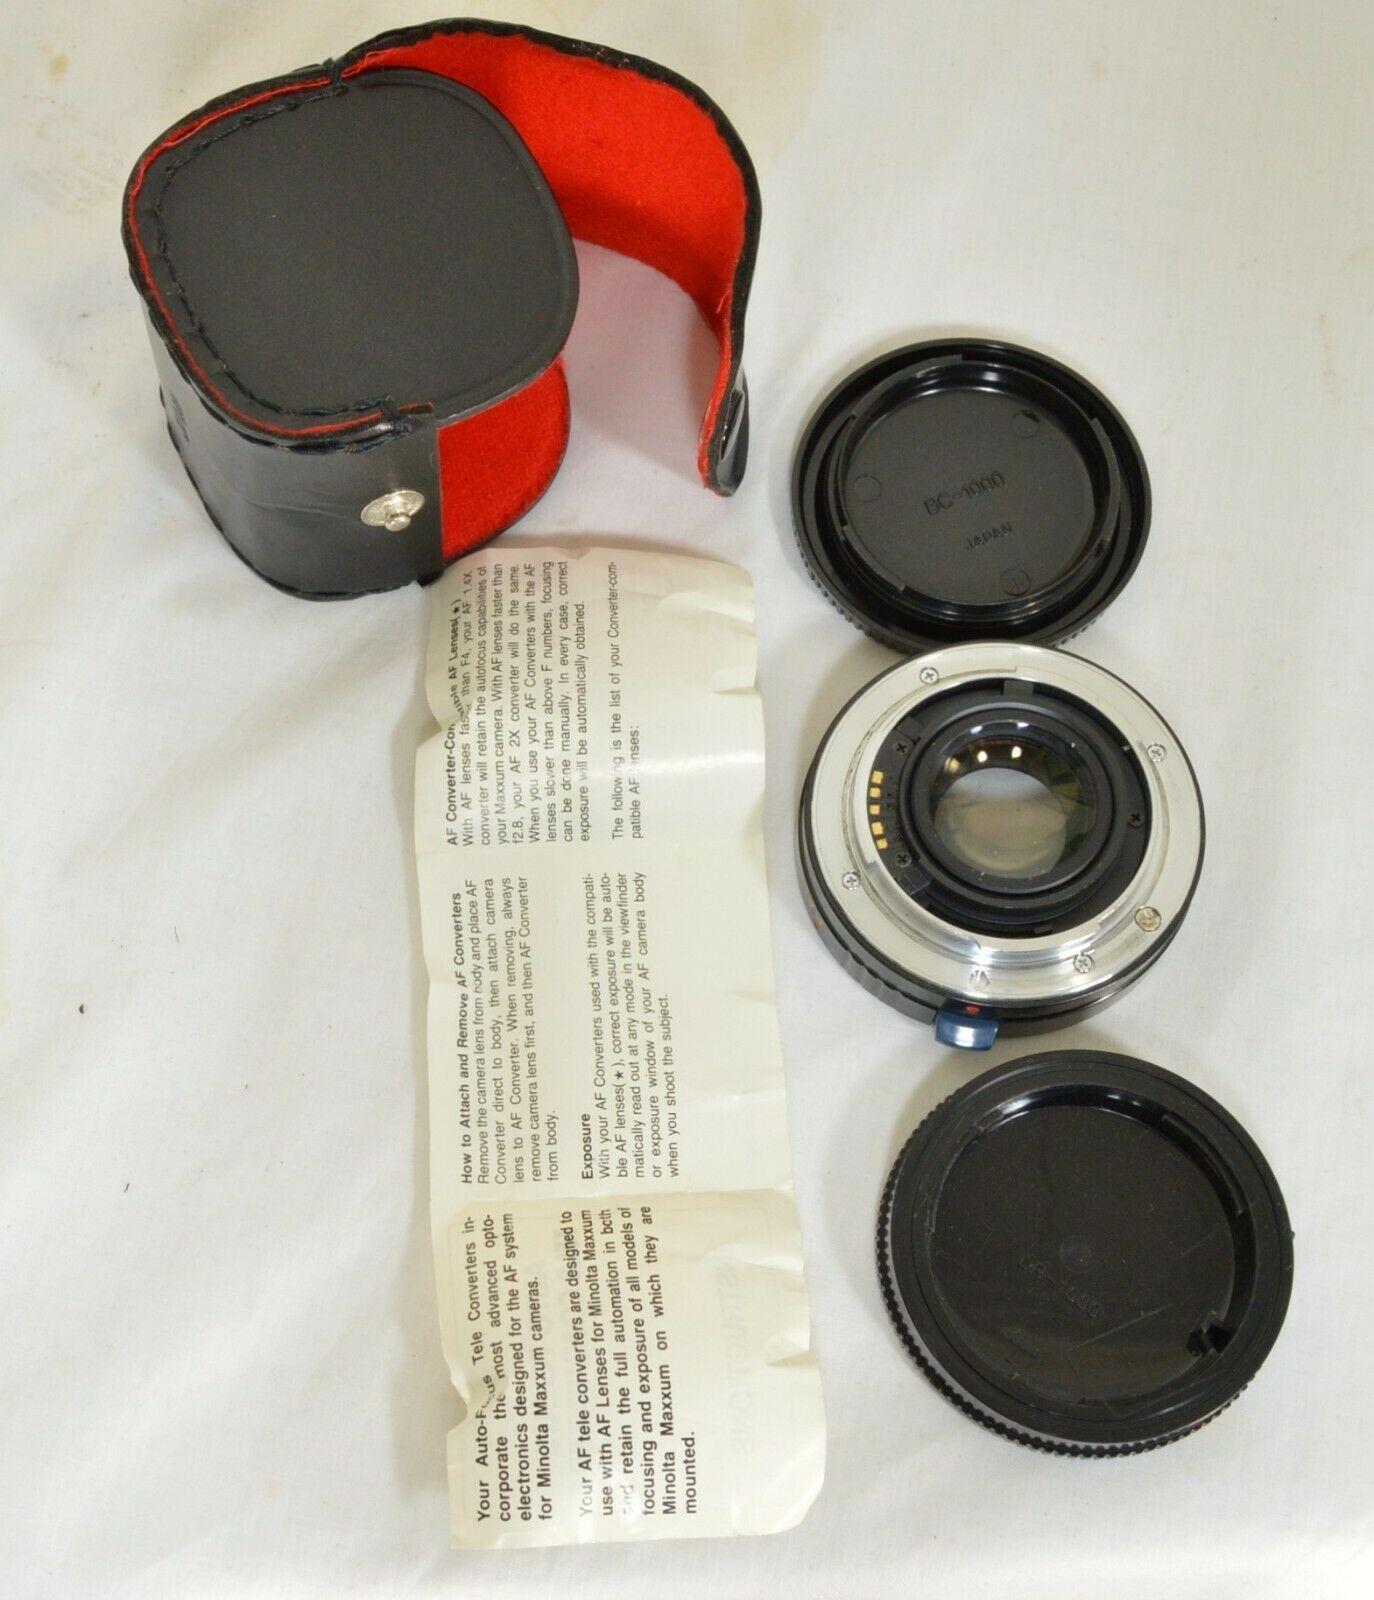 Kalimar 1.4 X M/AF Tele Converter Auto Focus camera lens w/ case & instructions image 8